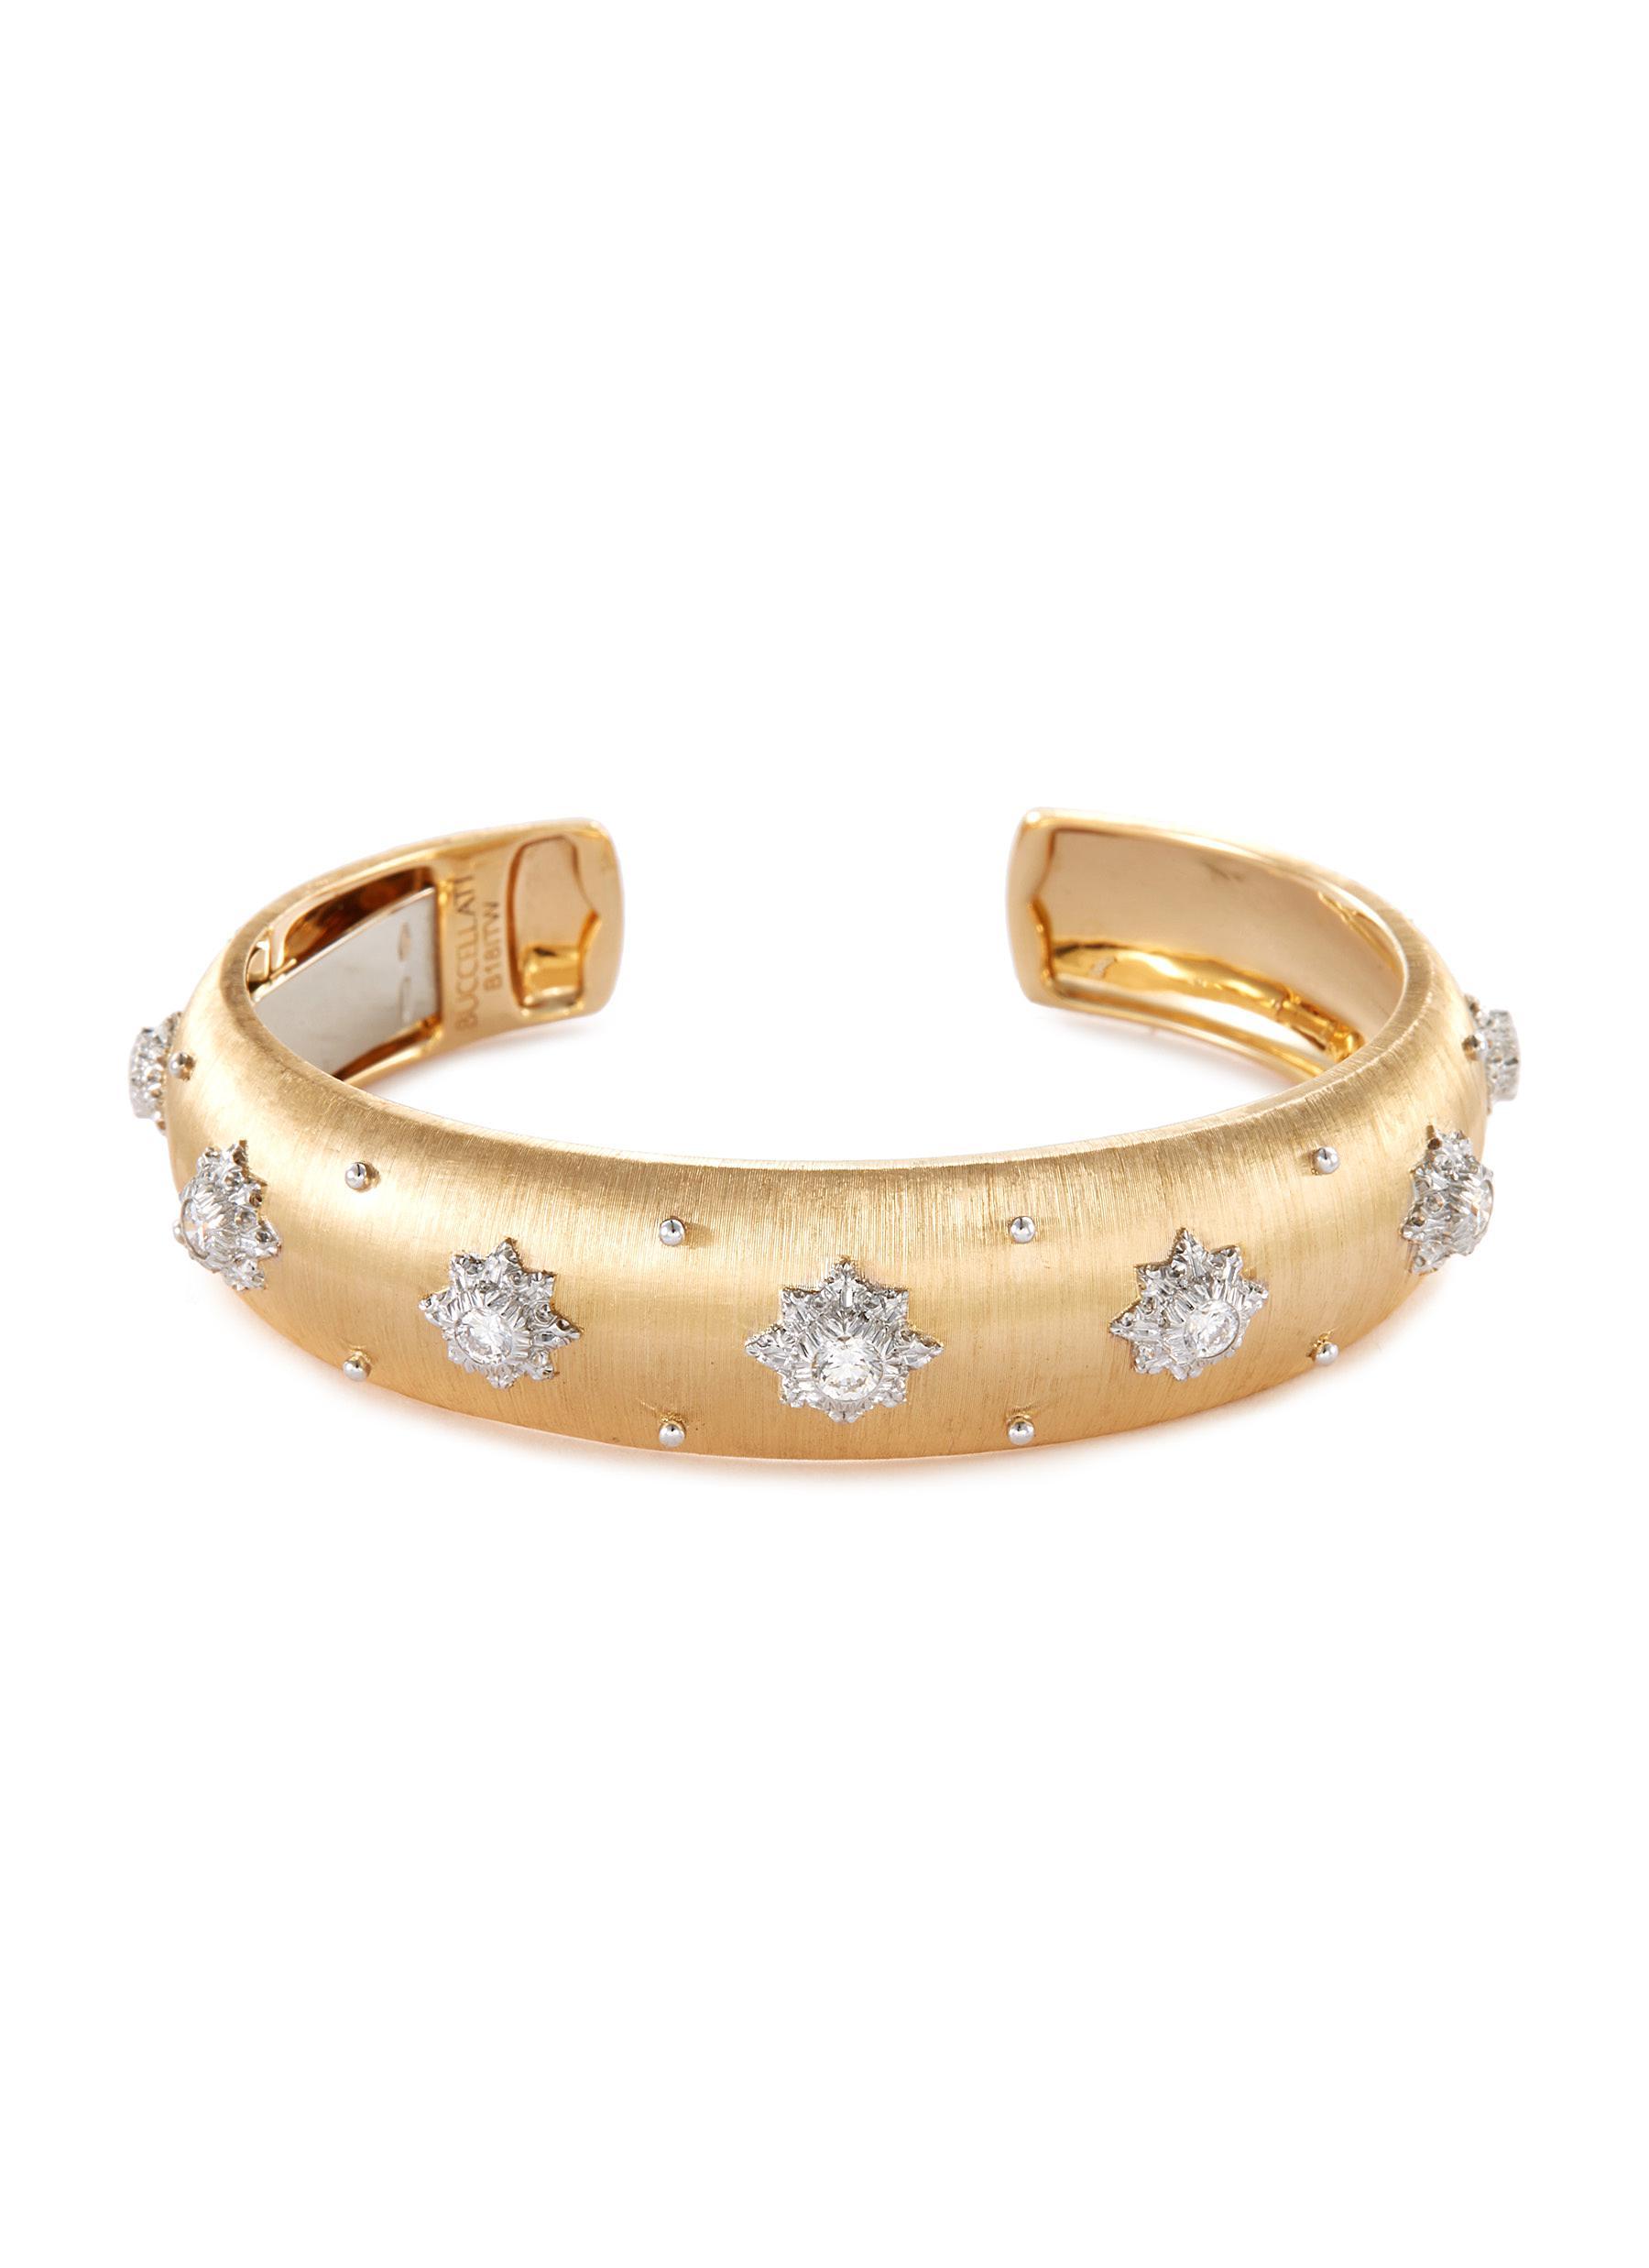 'Macri' diamond 18k yellow gold cuff